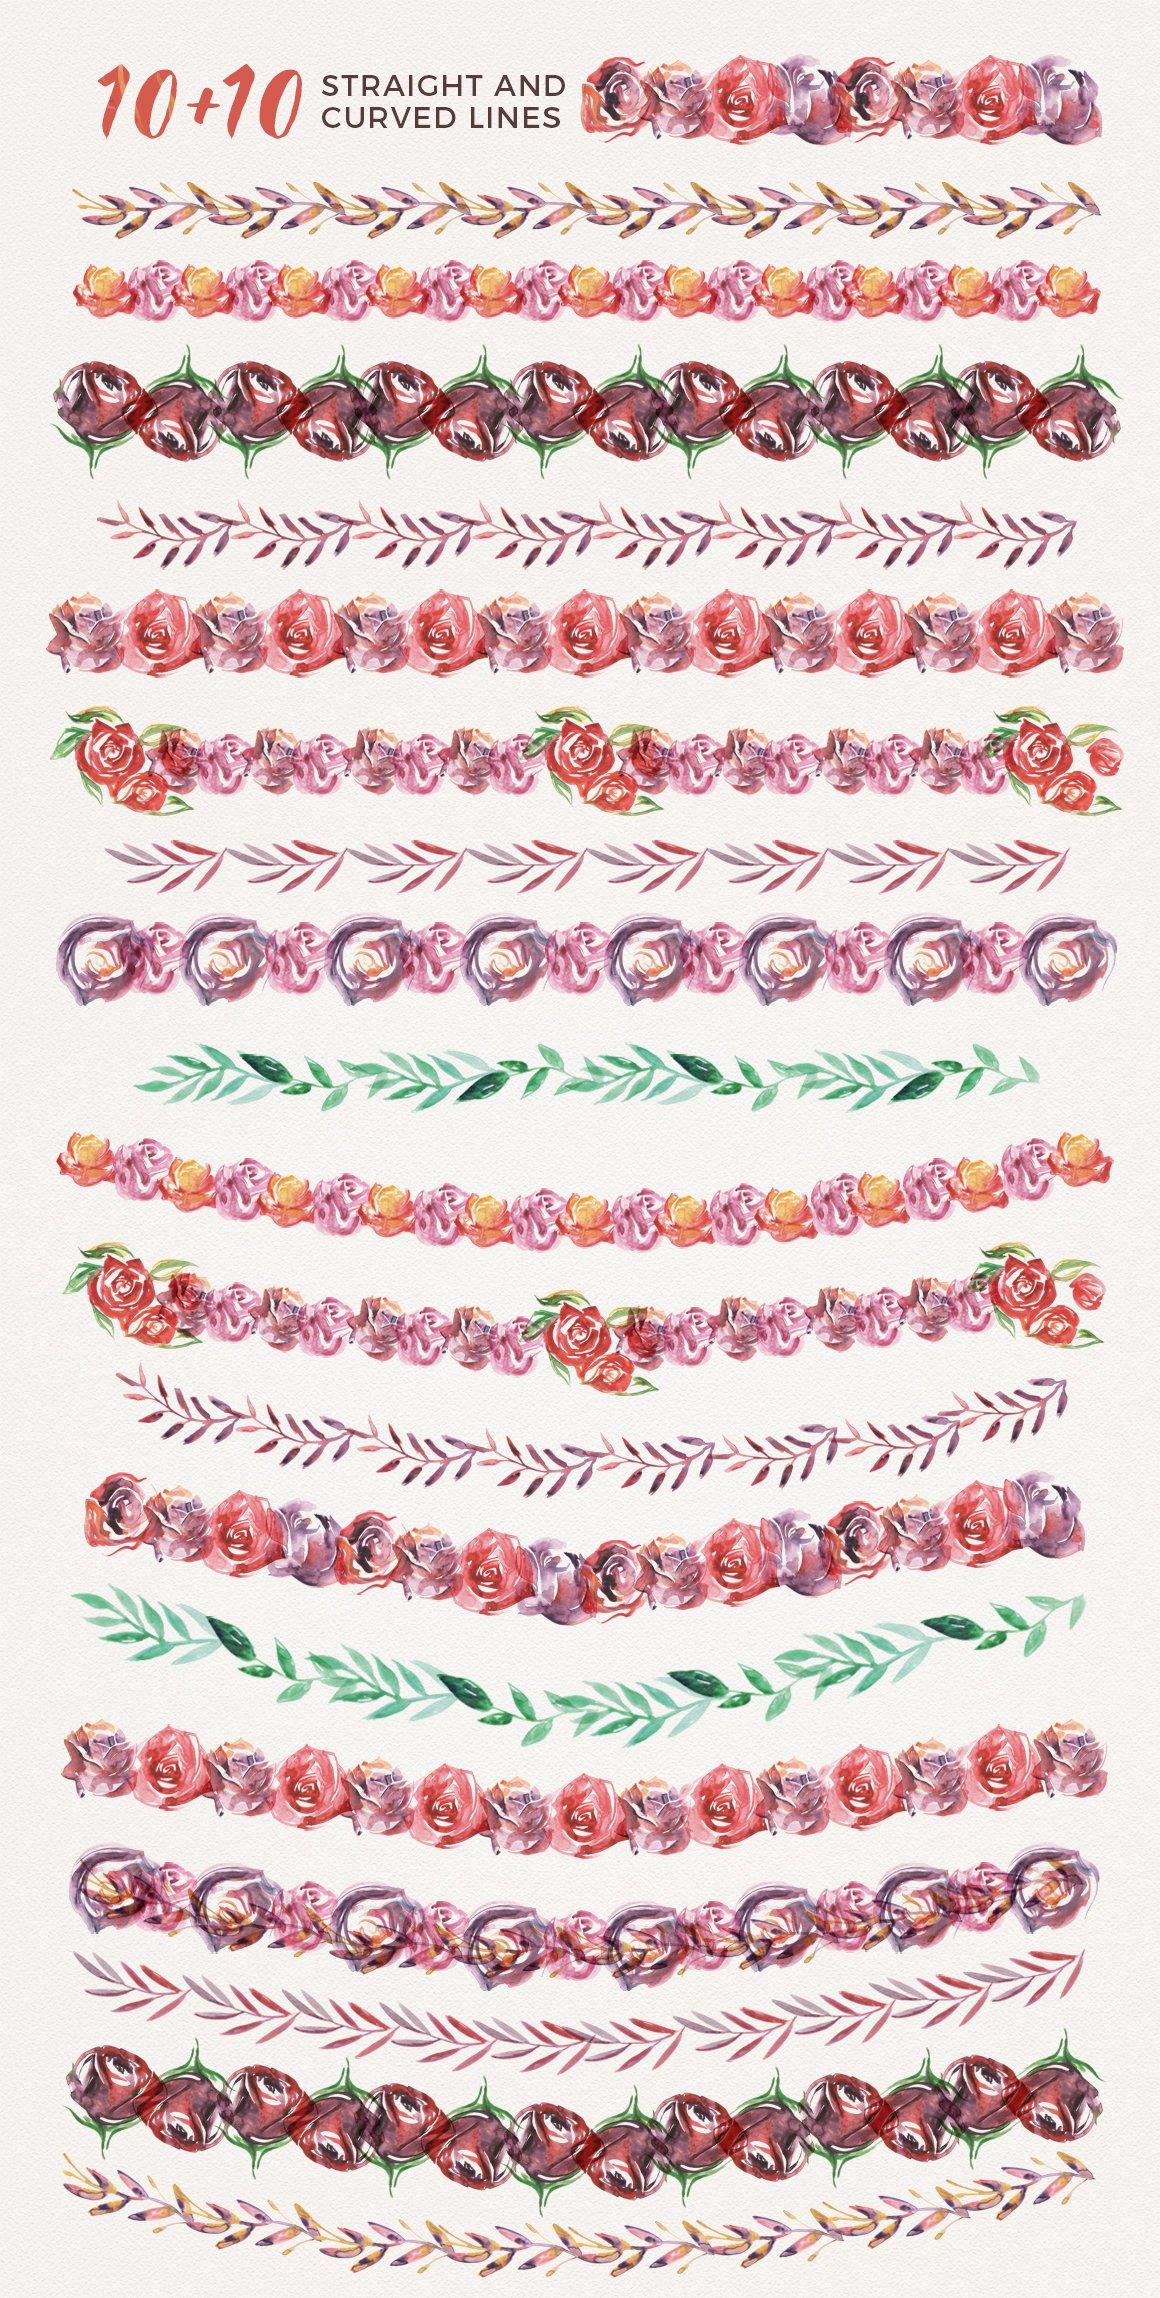 高清手绘花卉树叶水彩剪贴画PNG免抠图片素材 Watercolor Handmade Design Bundle插图(3)